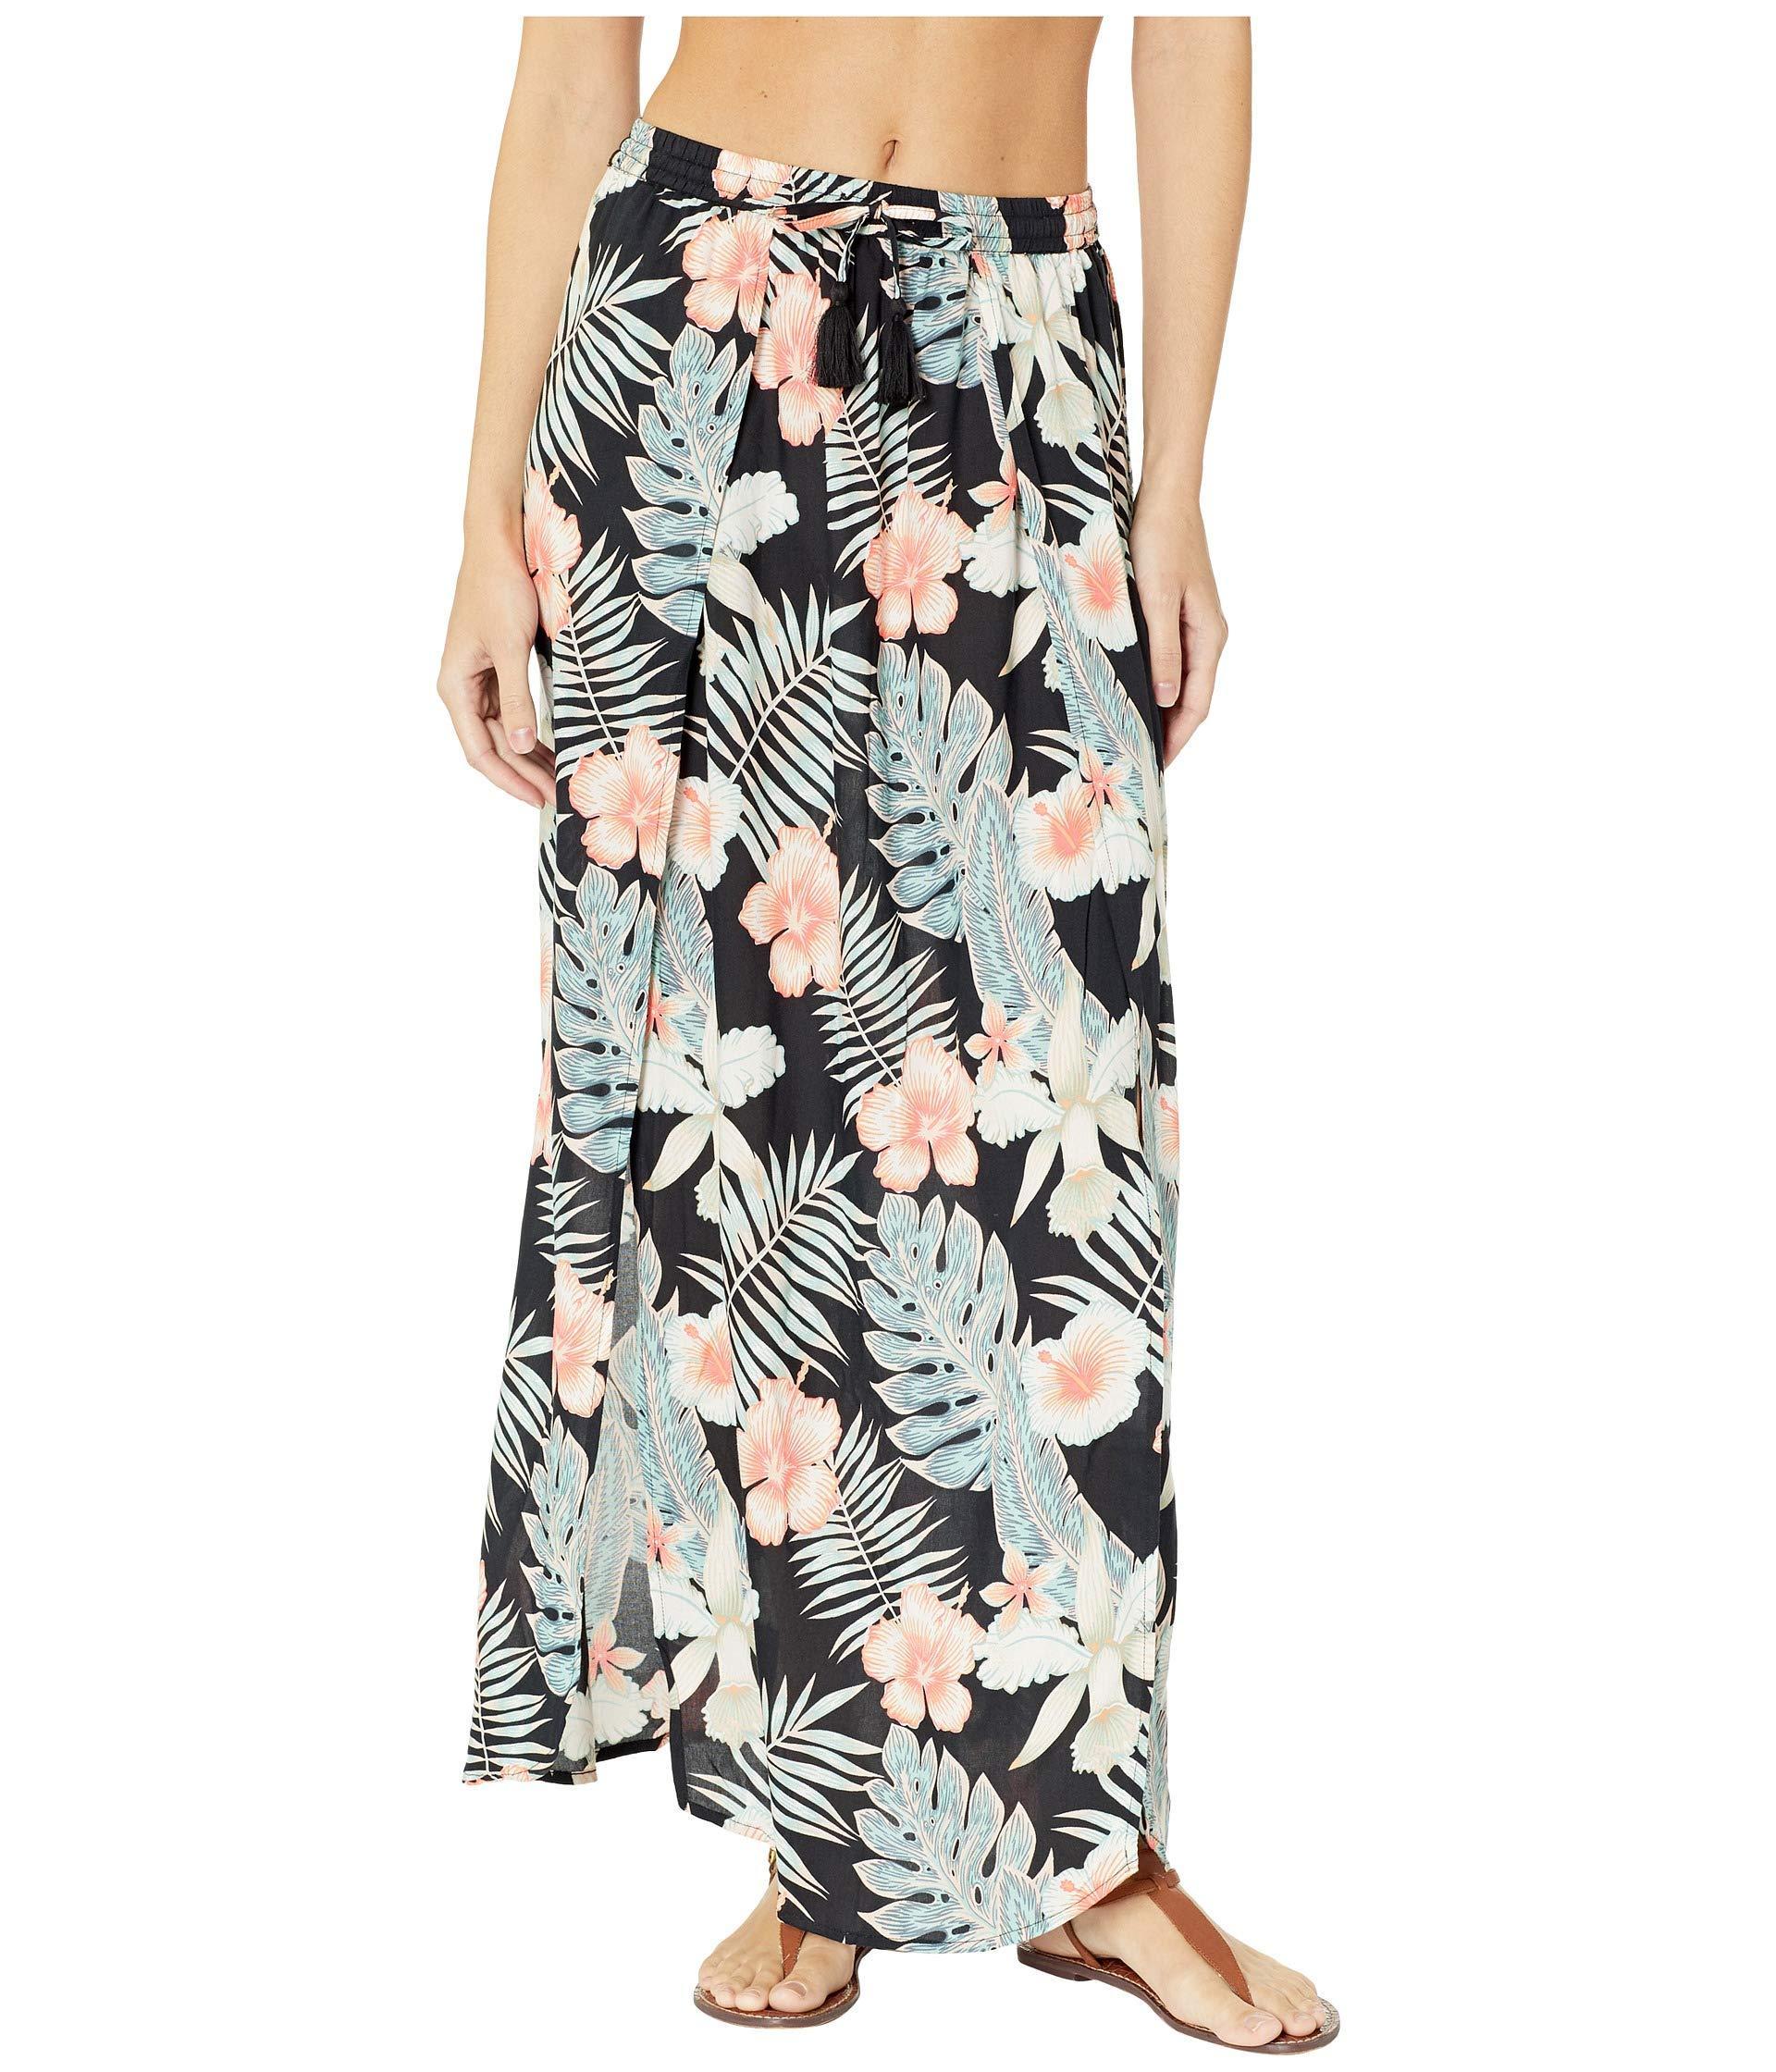 fdf49777d6 Roxy. Desert Garden Skirt Cover-up (anthracite Tropicalababa) Women s  Swimwear